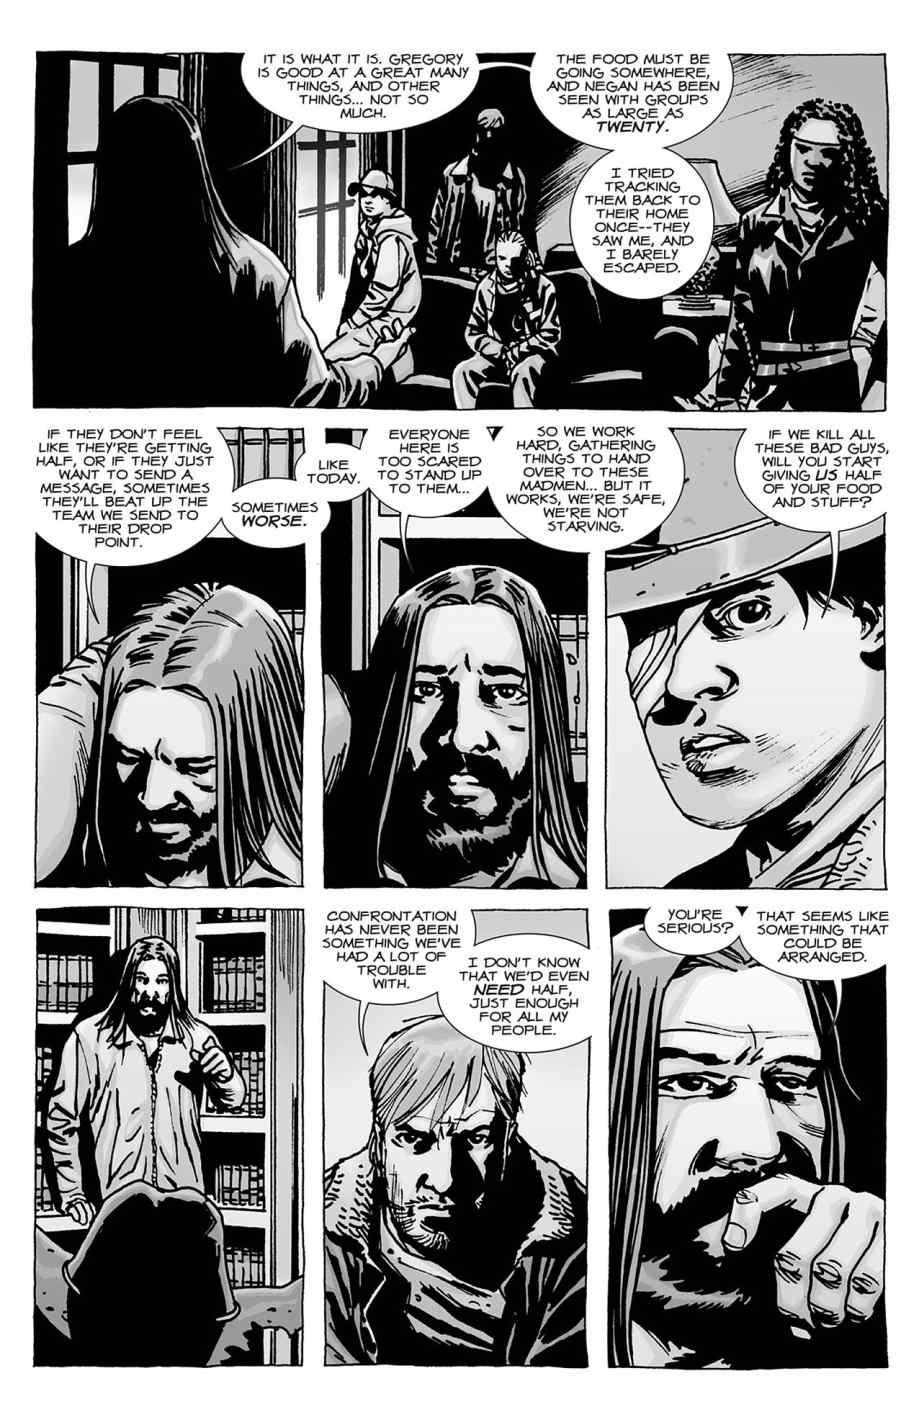 Read Comics Online Free - The Walking Dead - Chapter 096